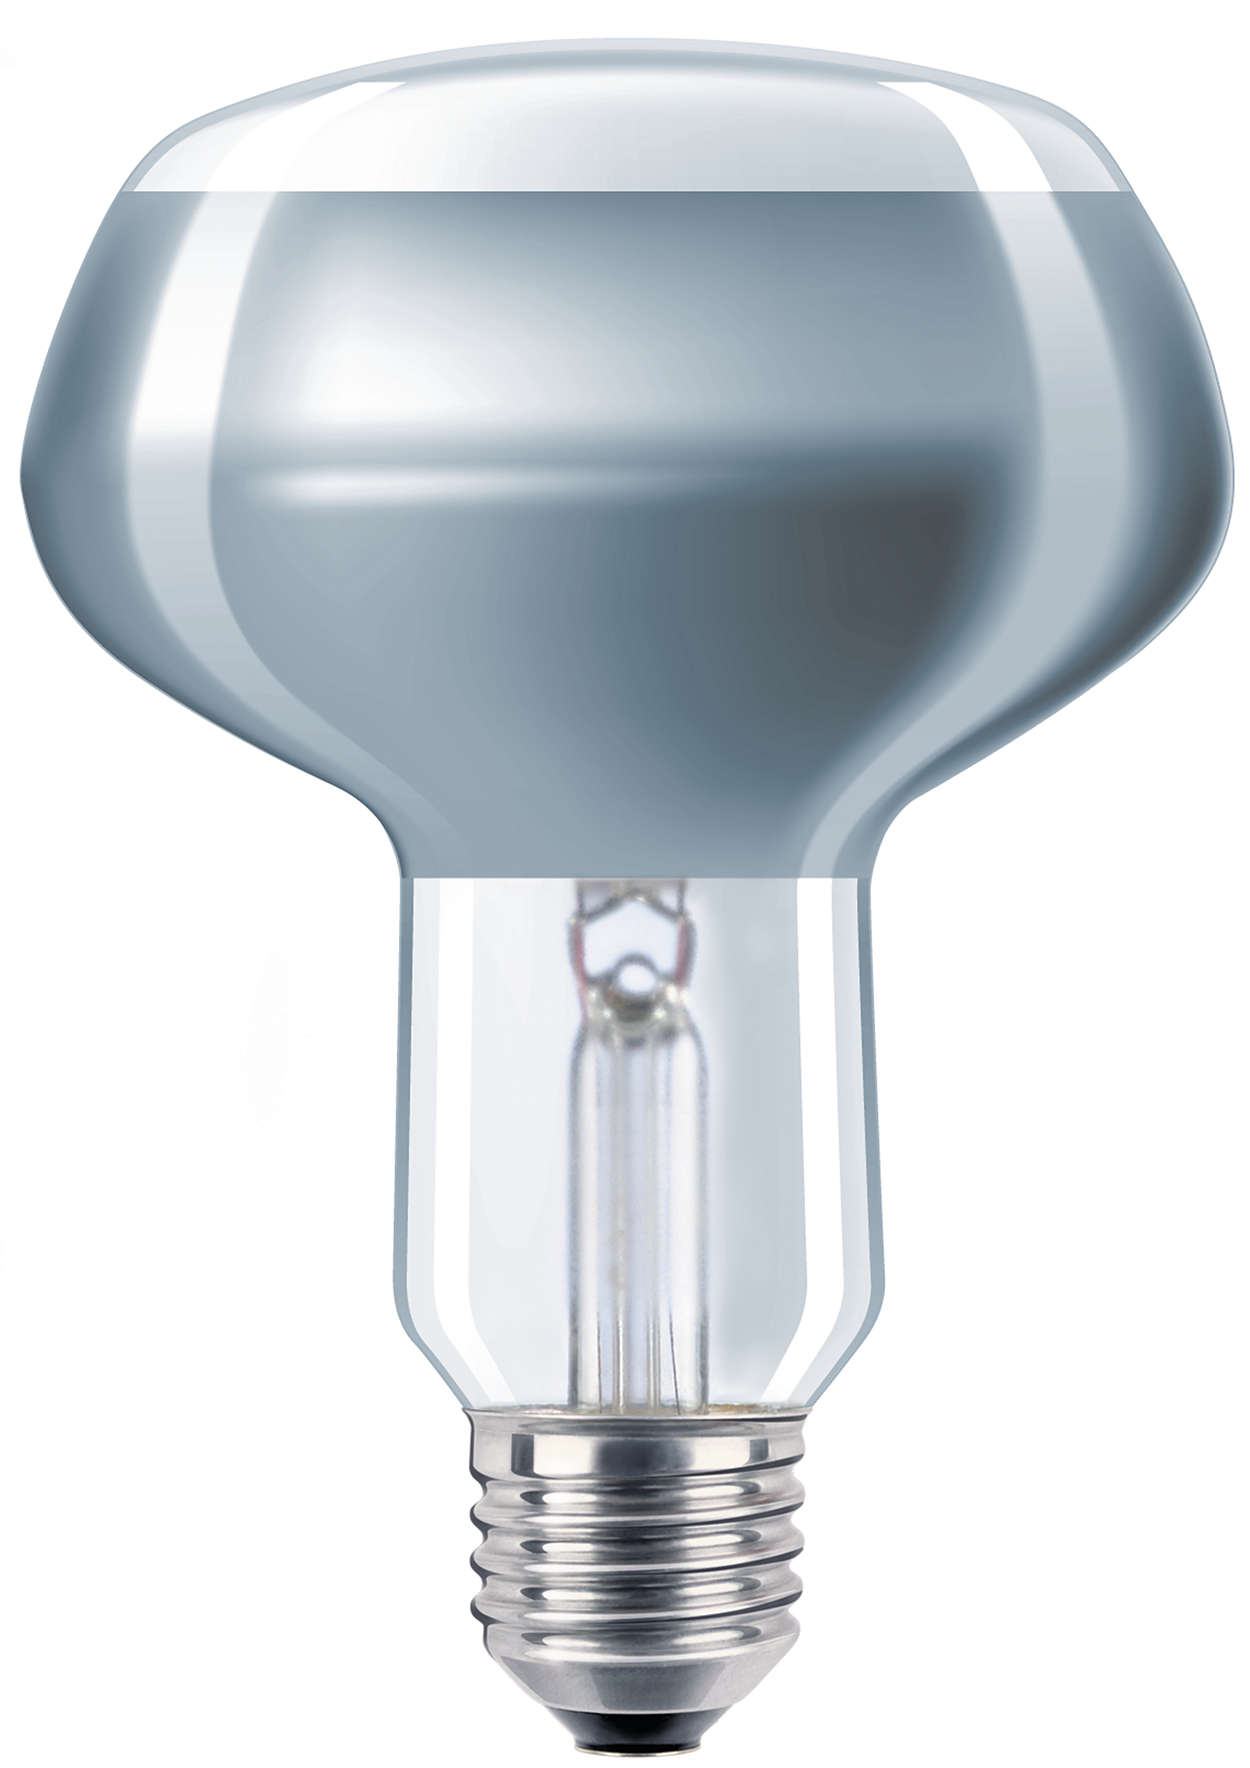 Gekleurde persglasreflector